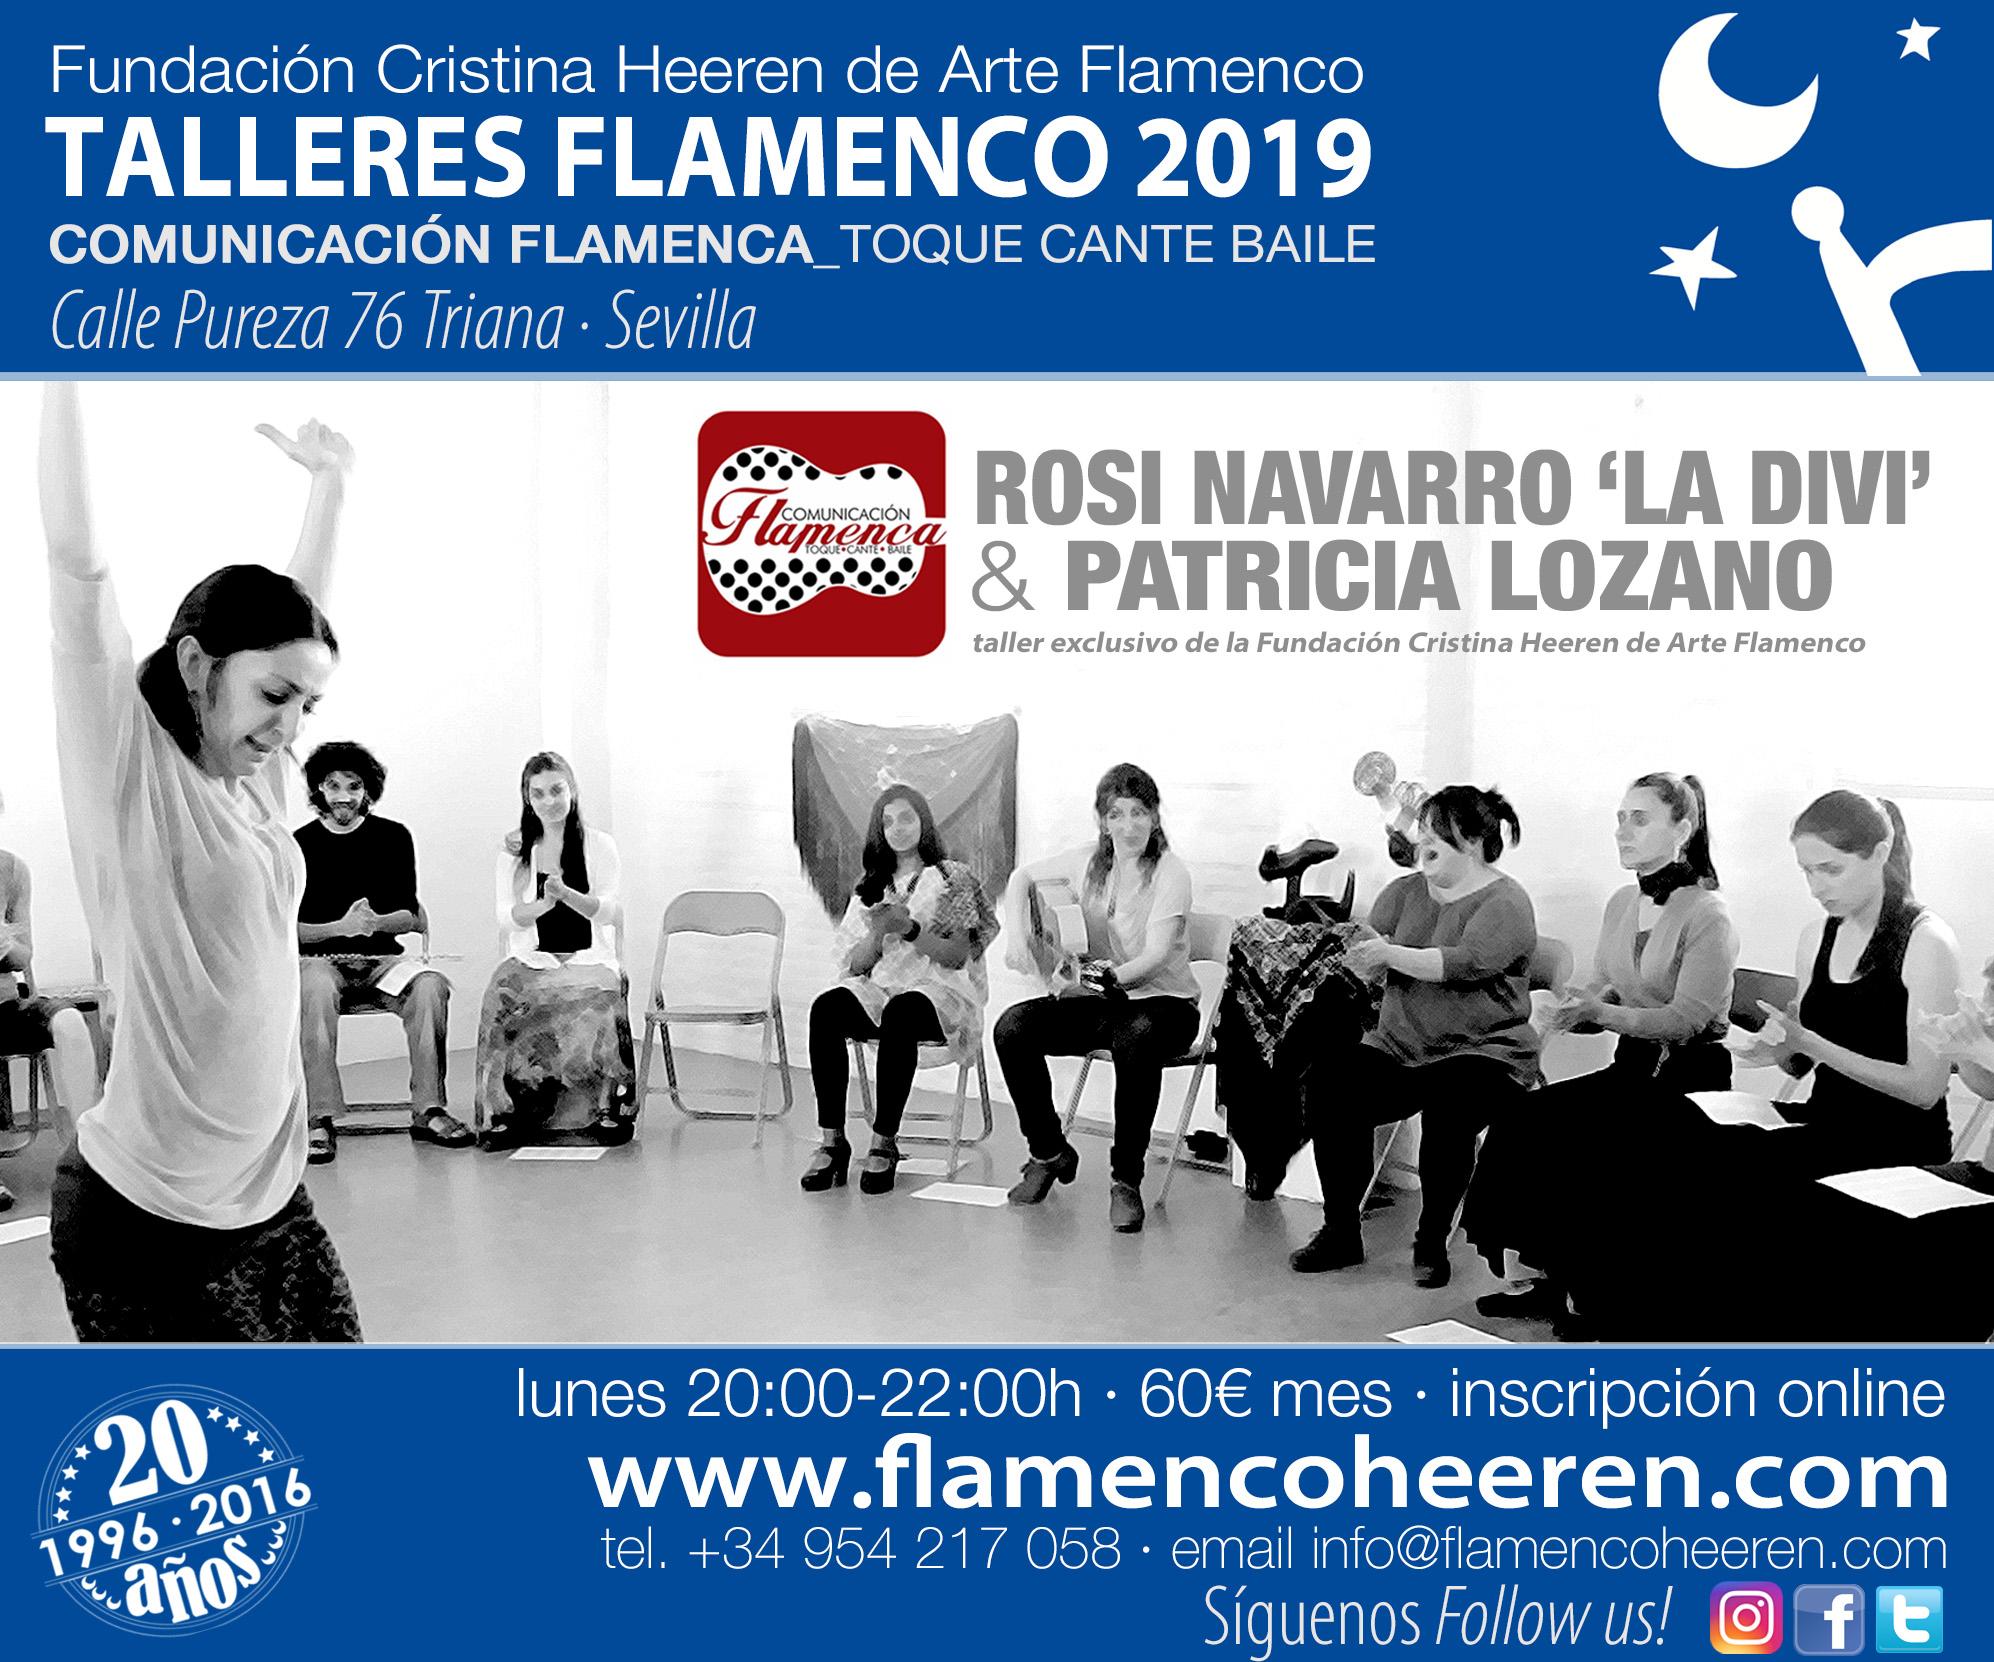 Talleres Flamenco 2019 - Cristina Heeren